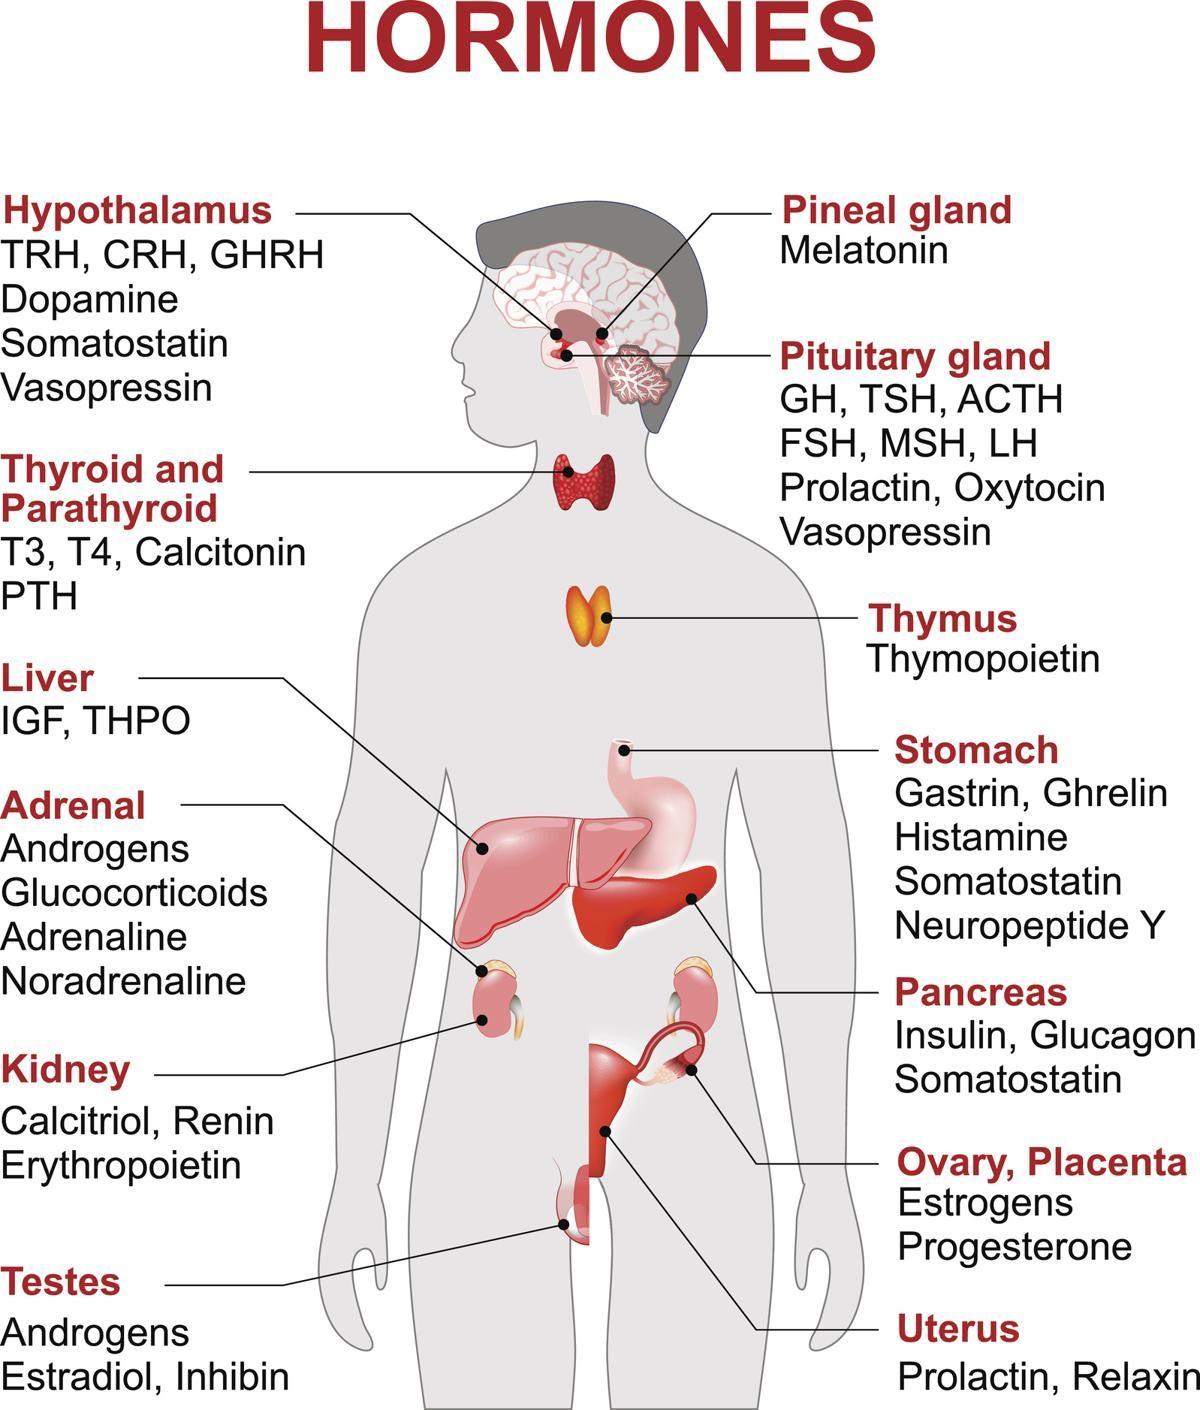 Endocrine Gland And Hormones